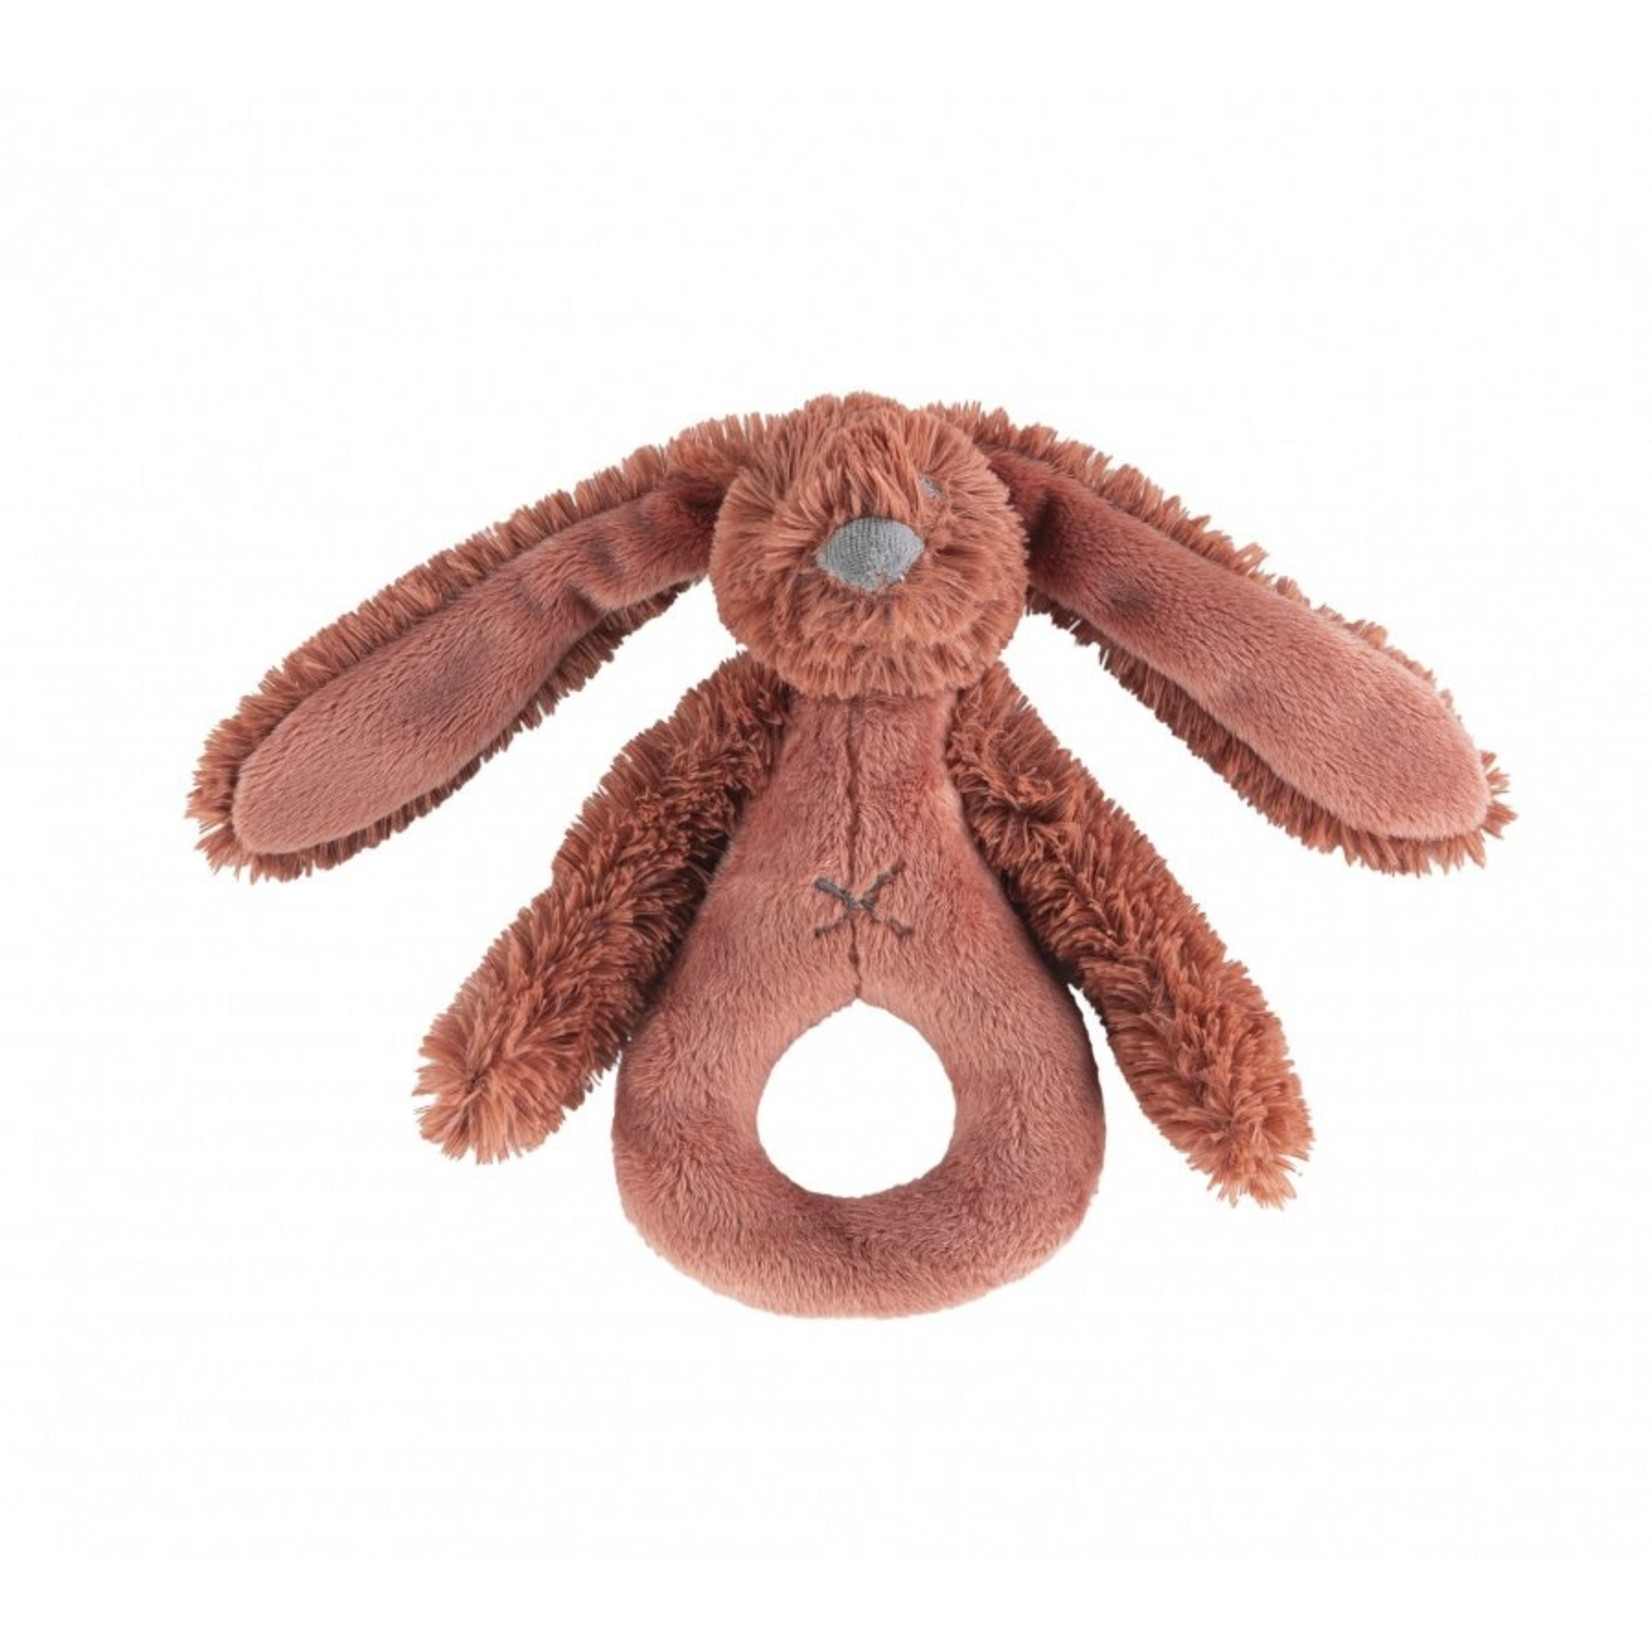 Rusty Rabbit Richie rattle 133023